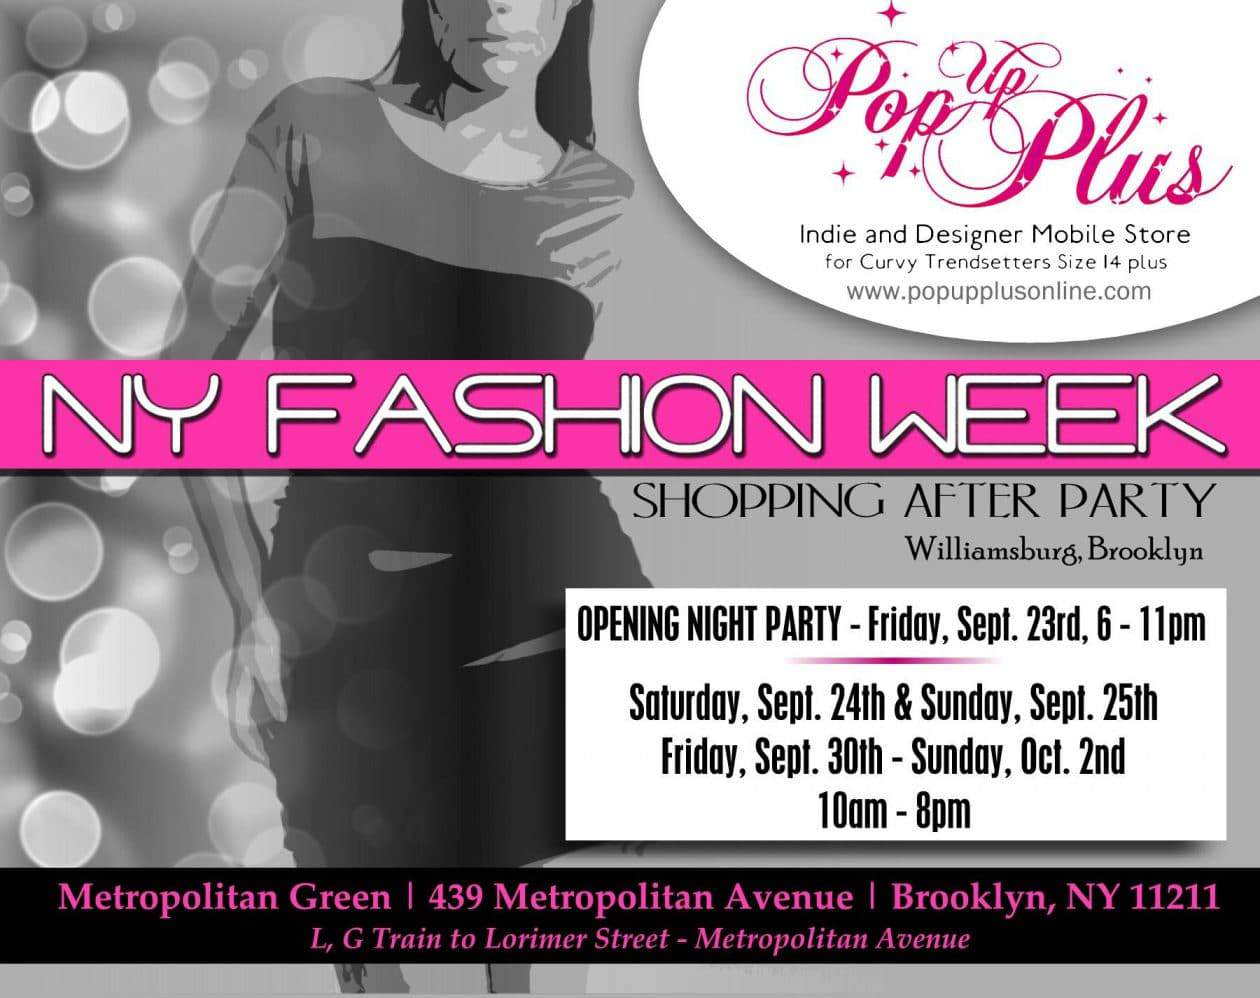 Pop Up Plus NYC